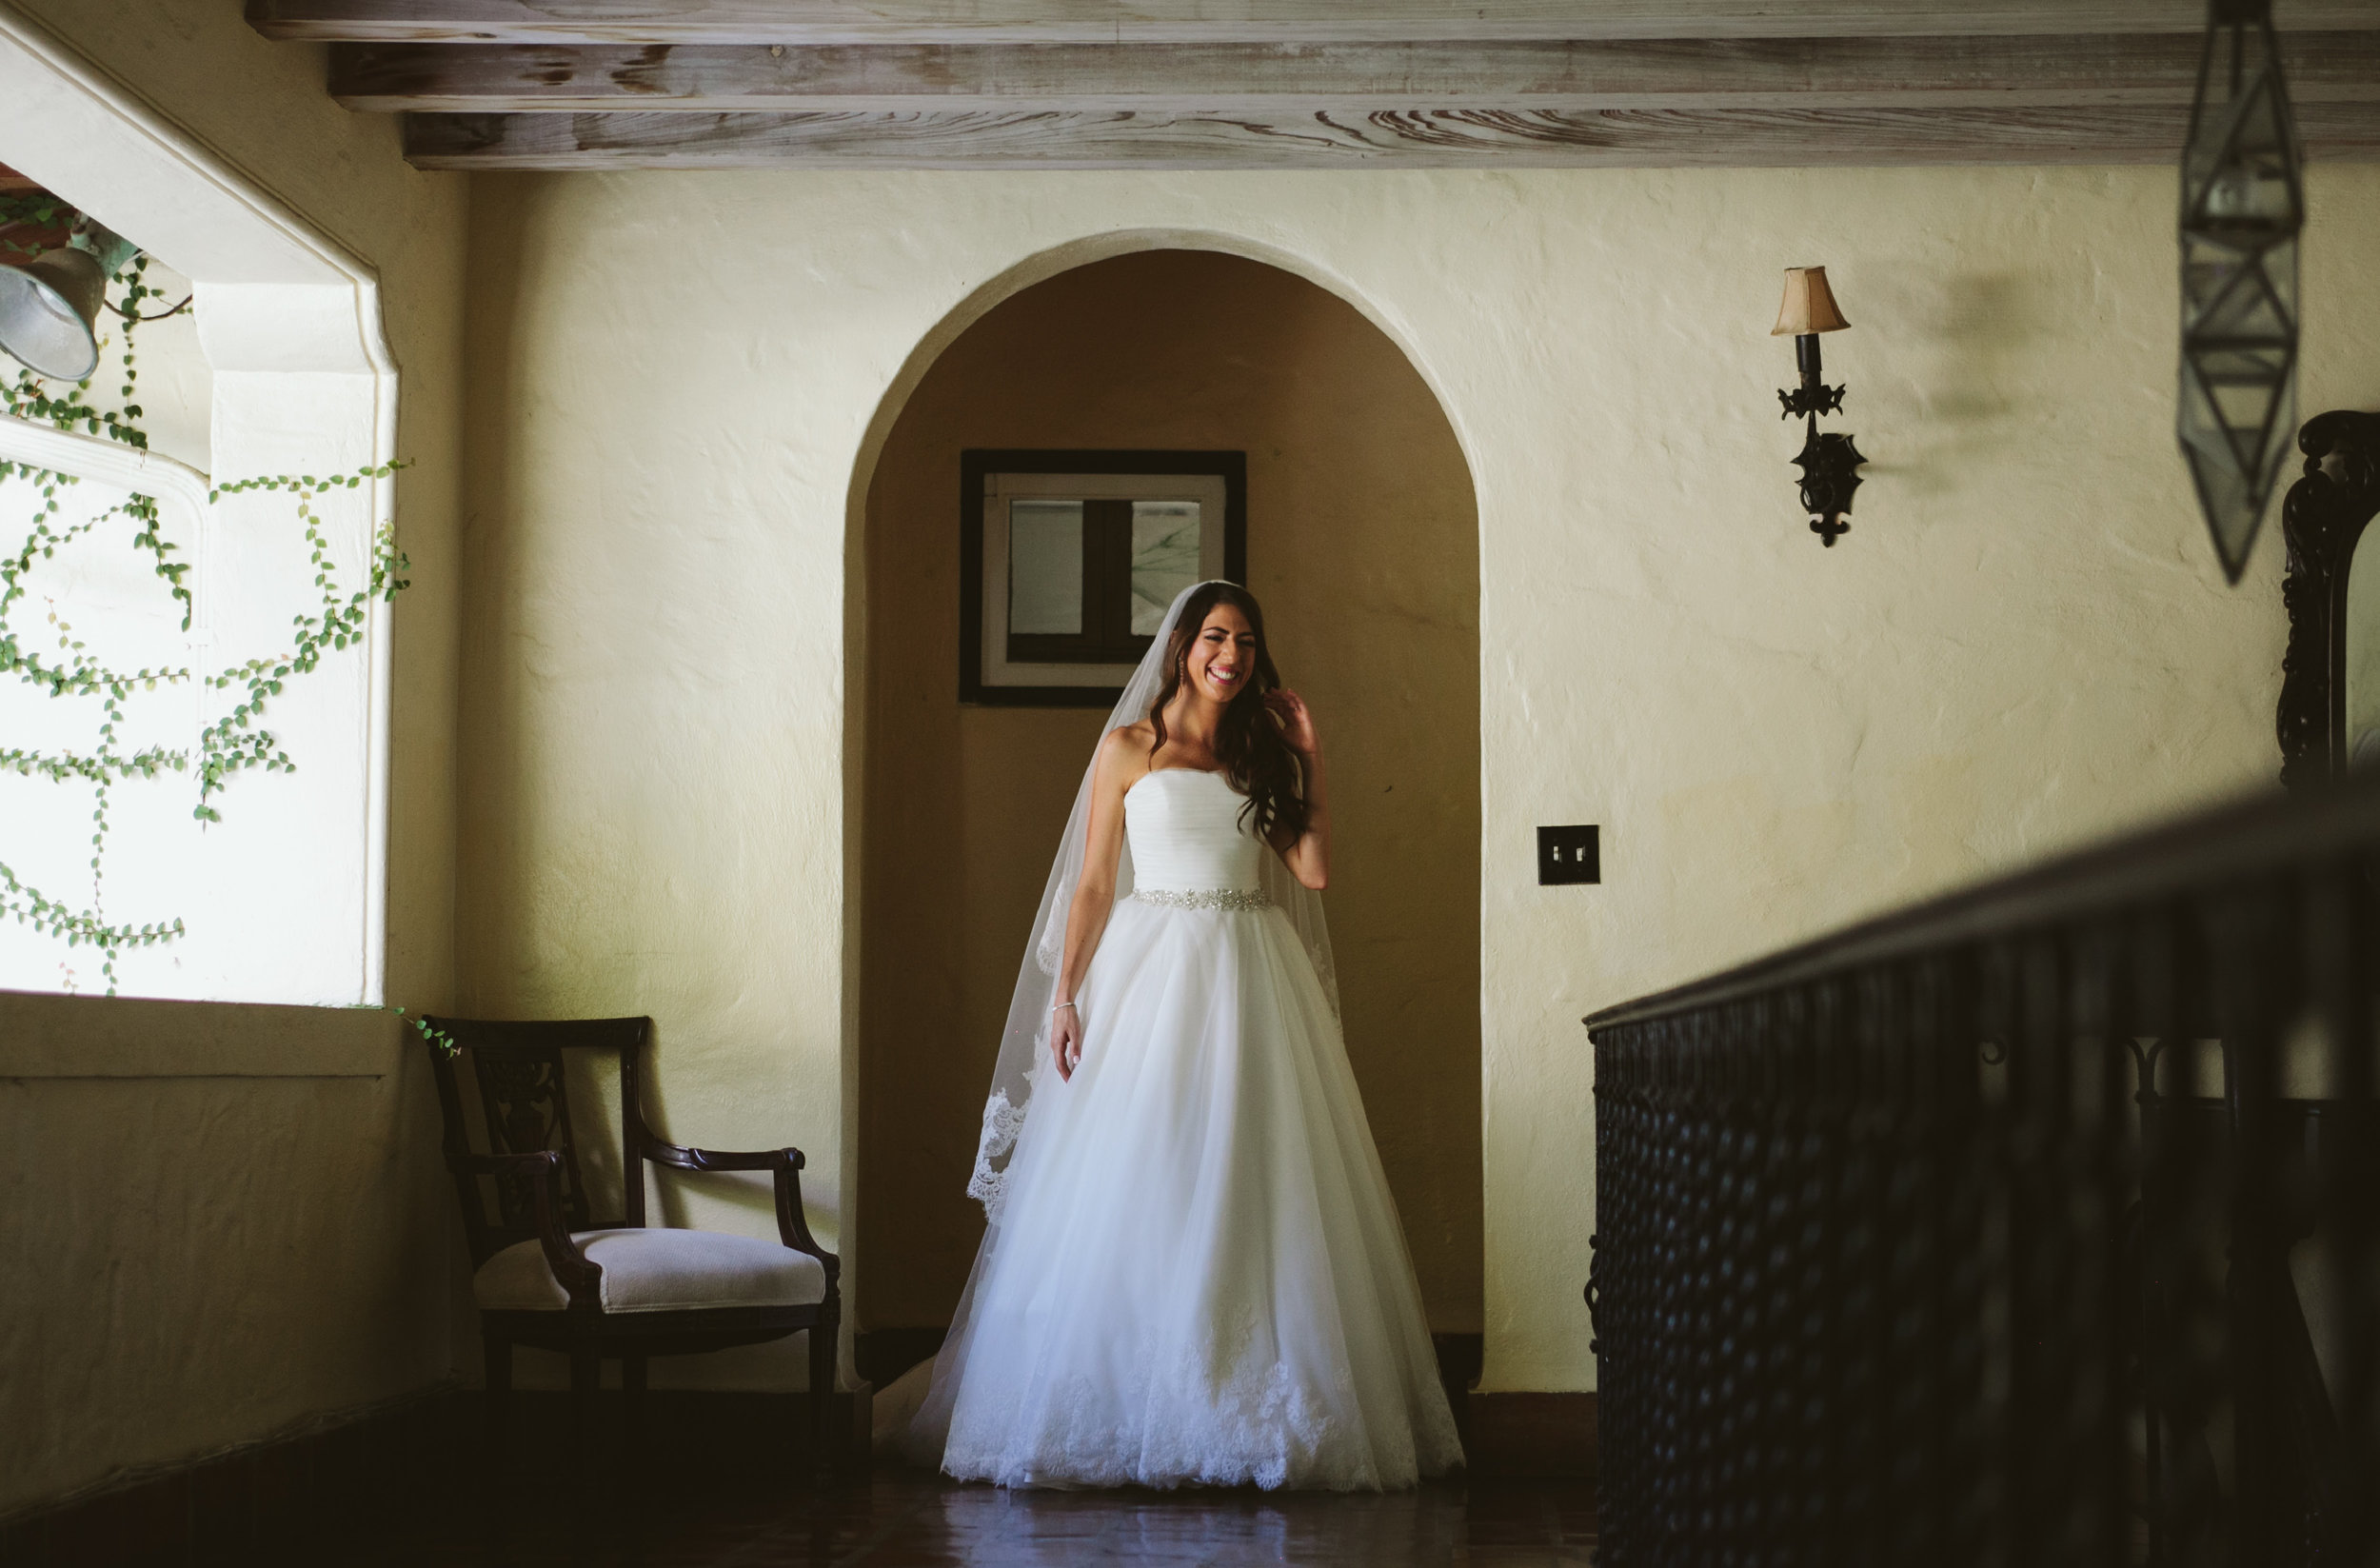 Meli + Mike Coconut Grove Wedding at Villa Woodbine24.jpg